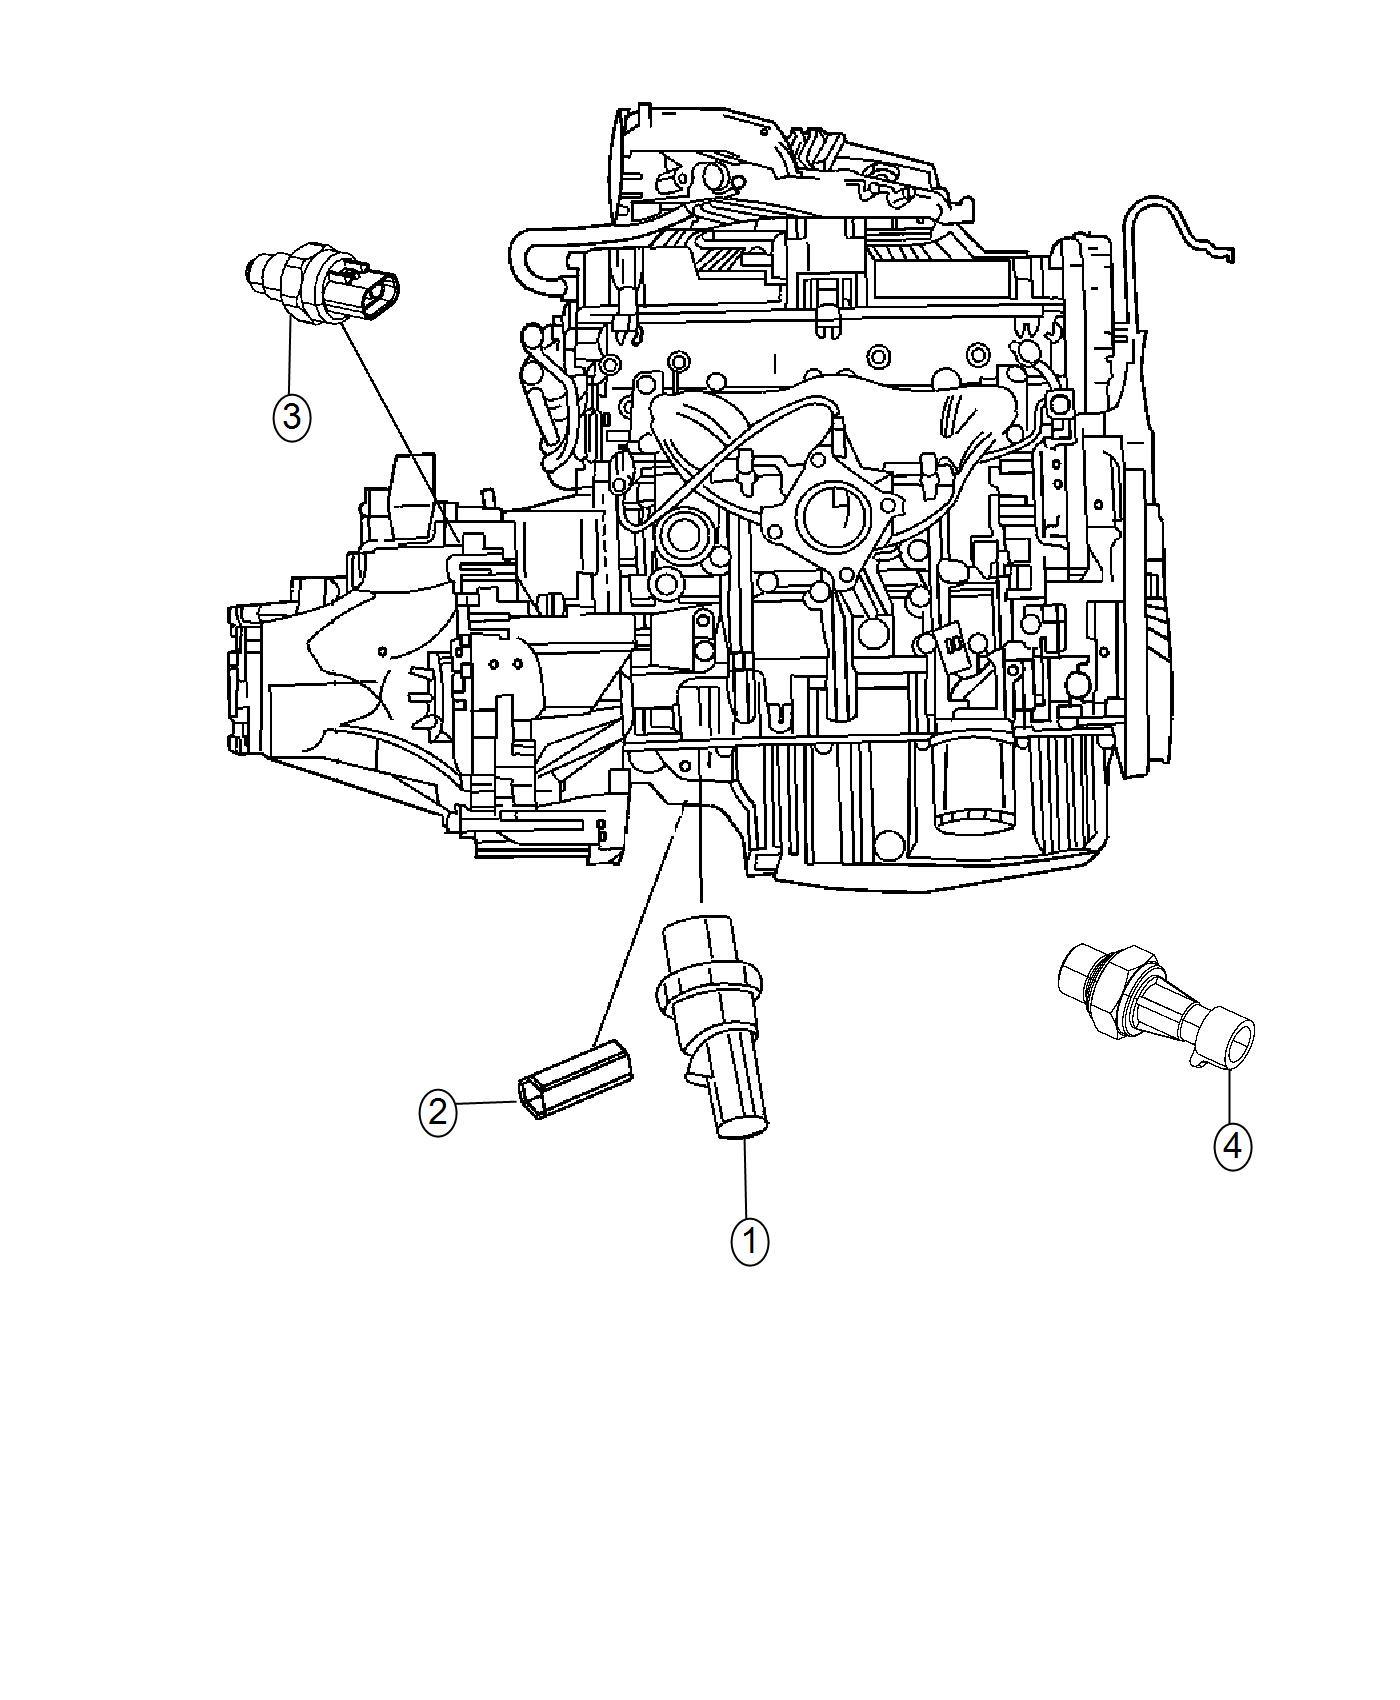 2017 Jeep Compass Shield. Wiring. Powertrain, engine